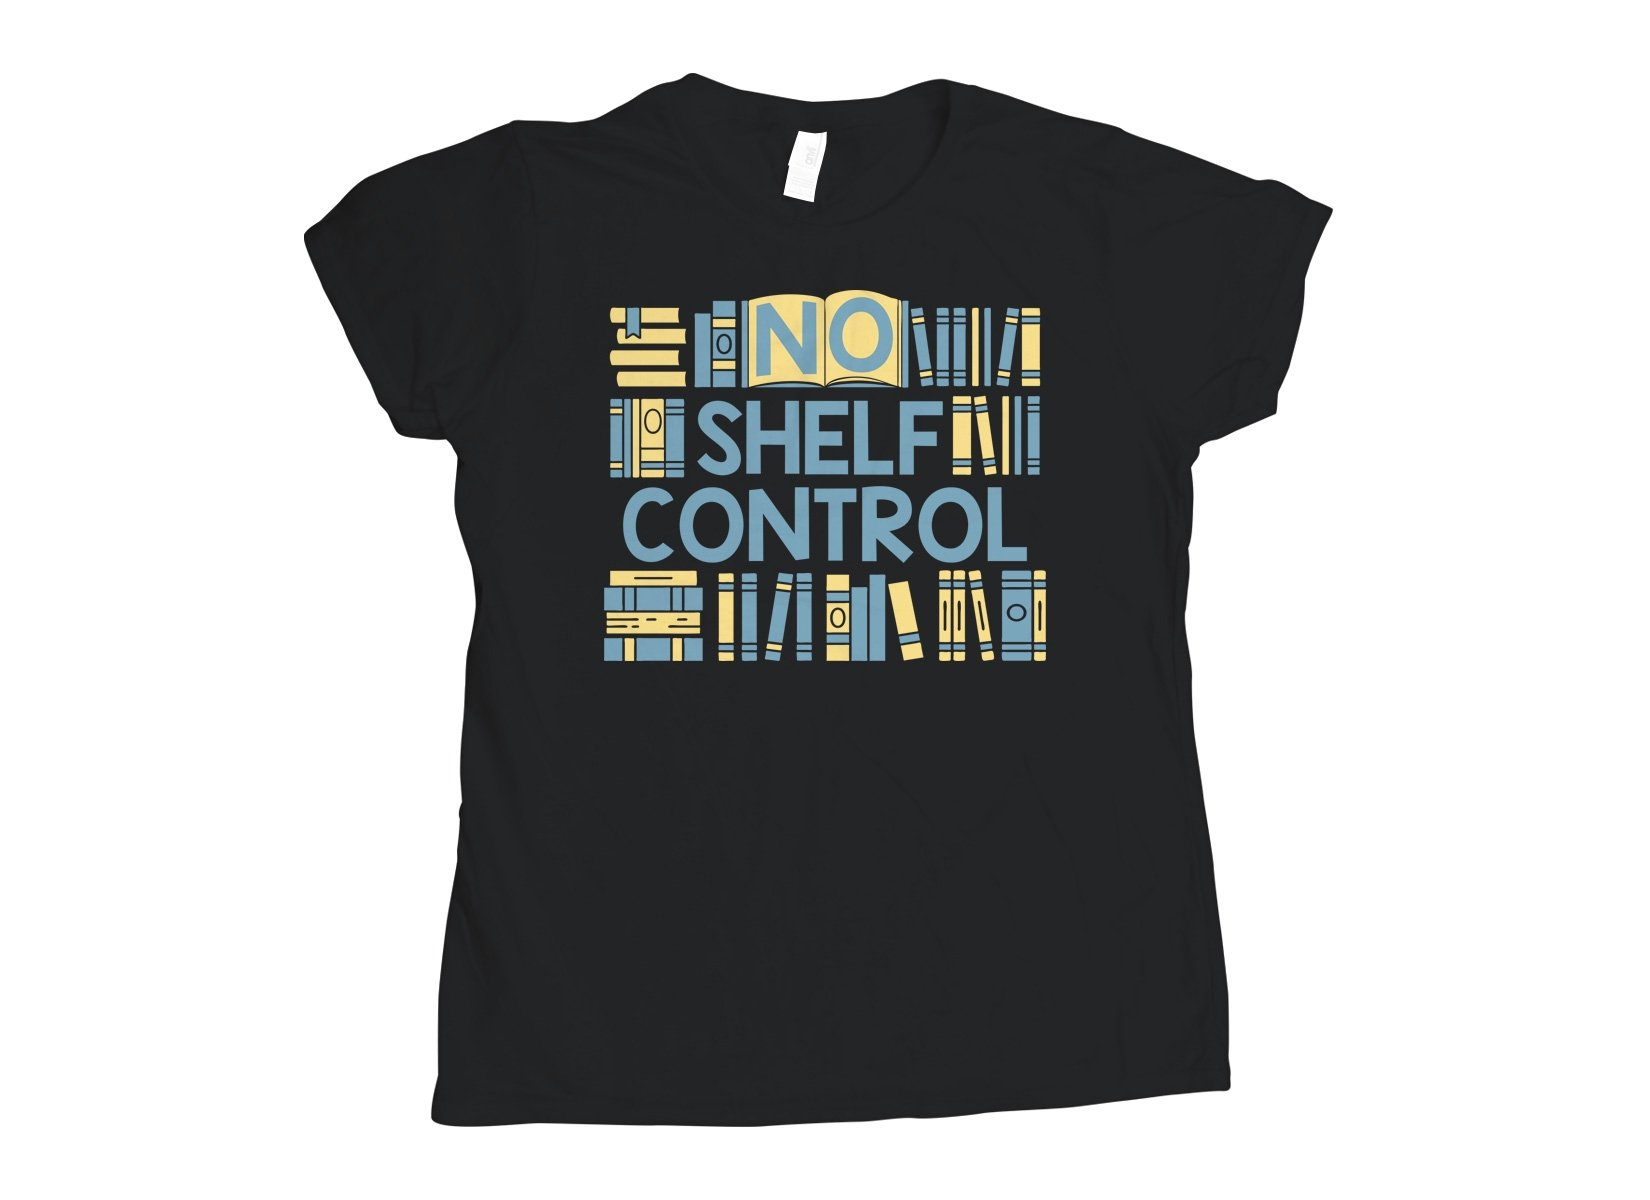 No Shelf Control on Womens T-Shirt